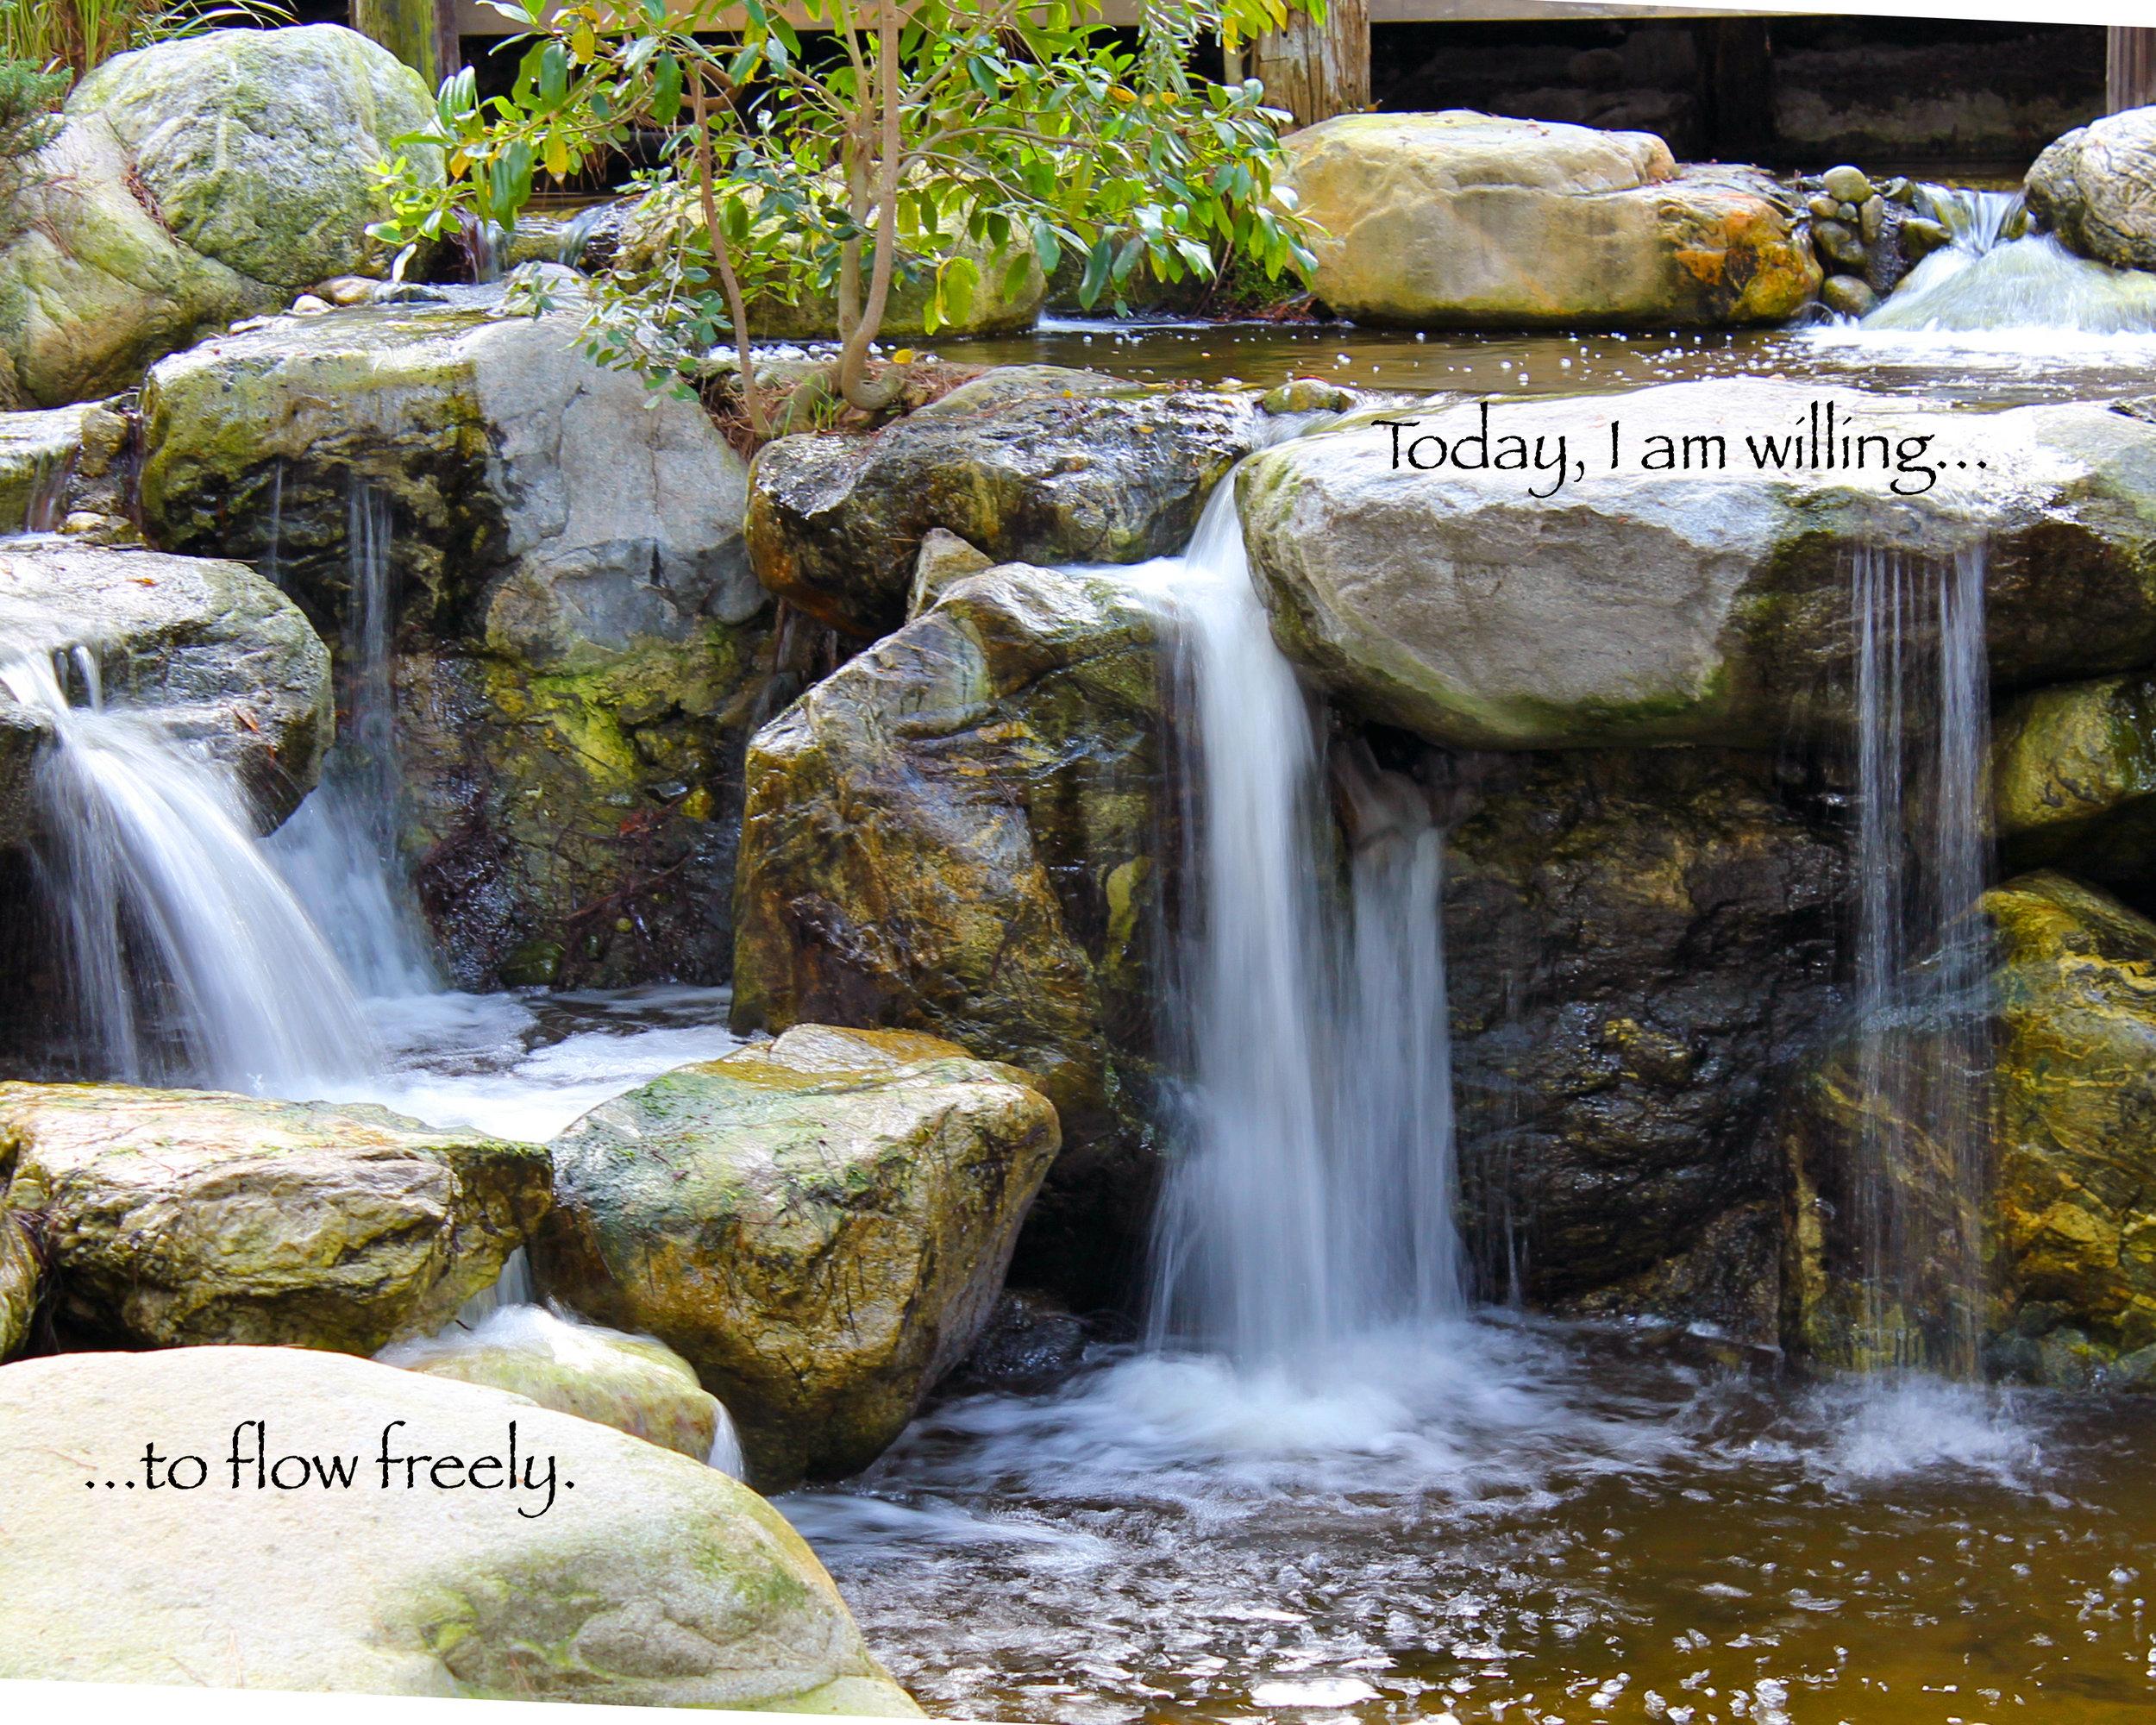 waterfall_flow freely.jpg